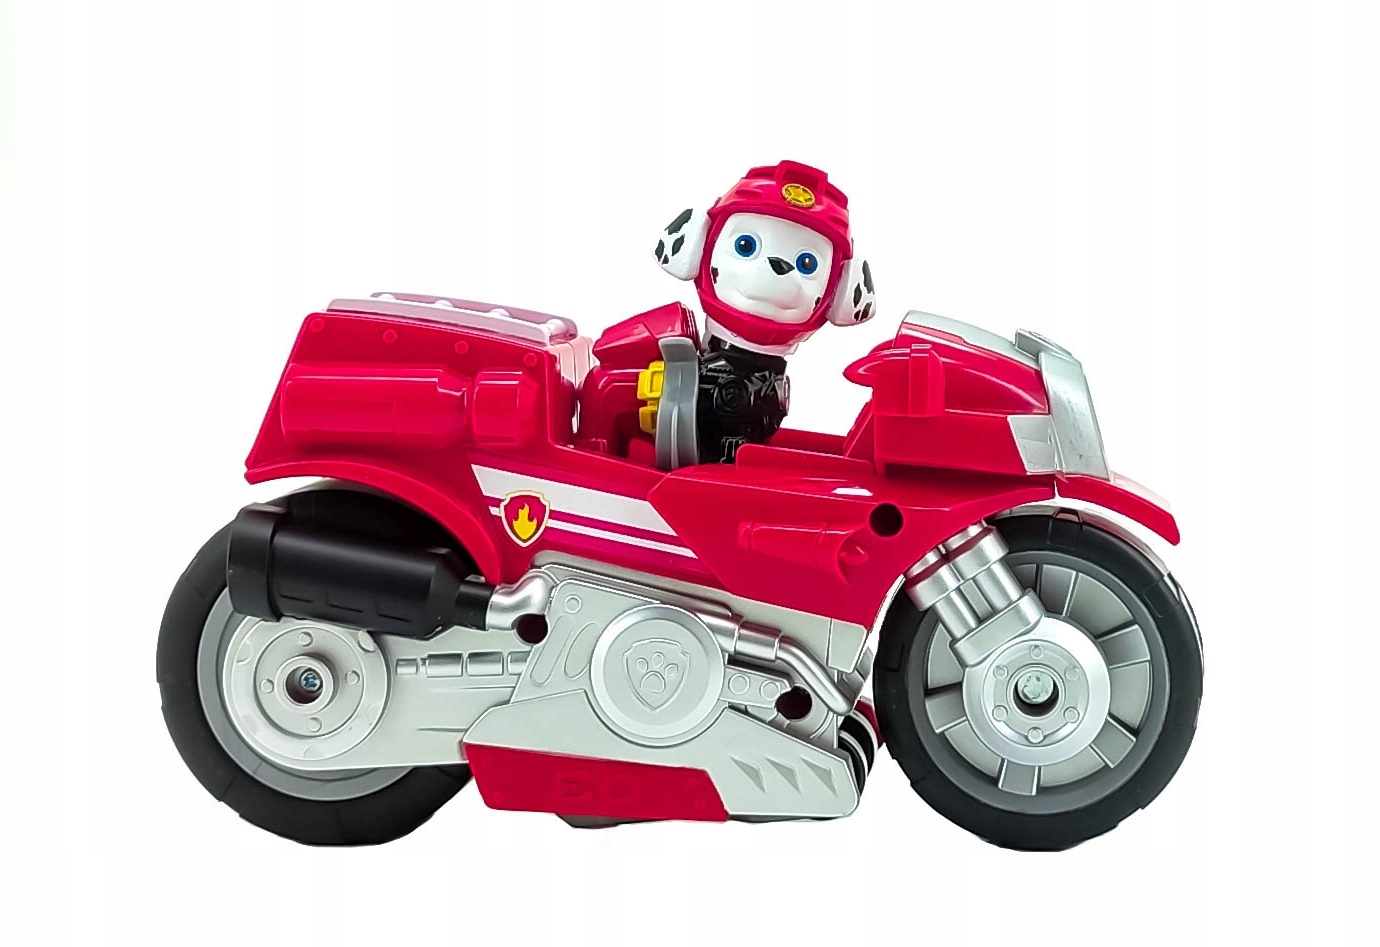 PSI PATROL MARSHALL FIGURKA I MOTOCYKL MOTO PUPS EAN 778988330456